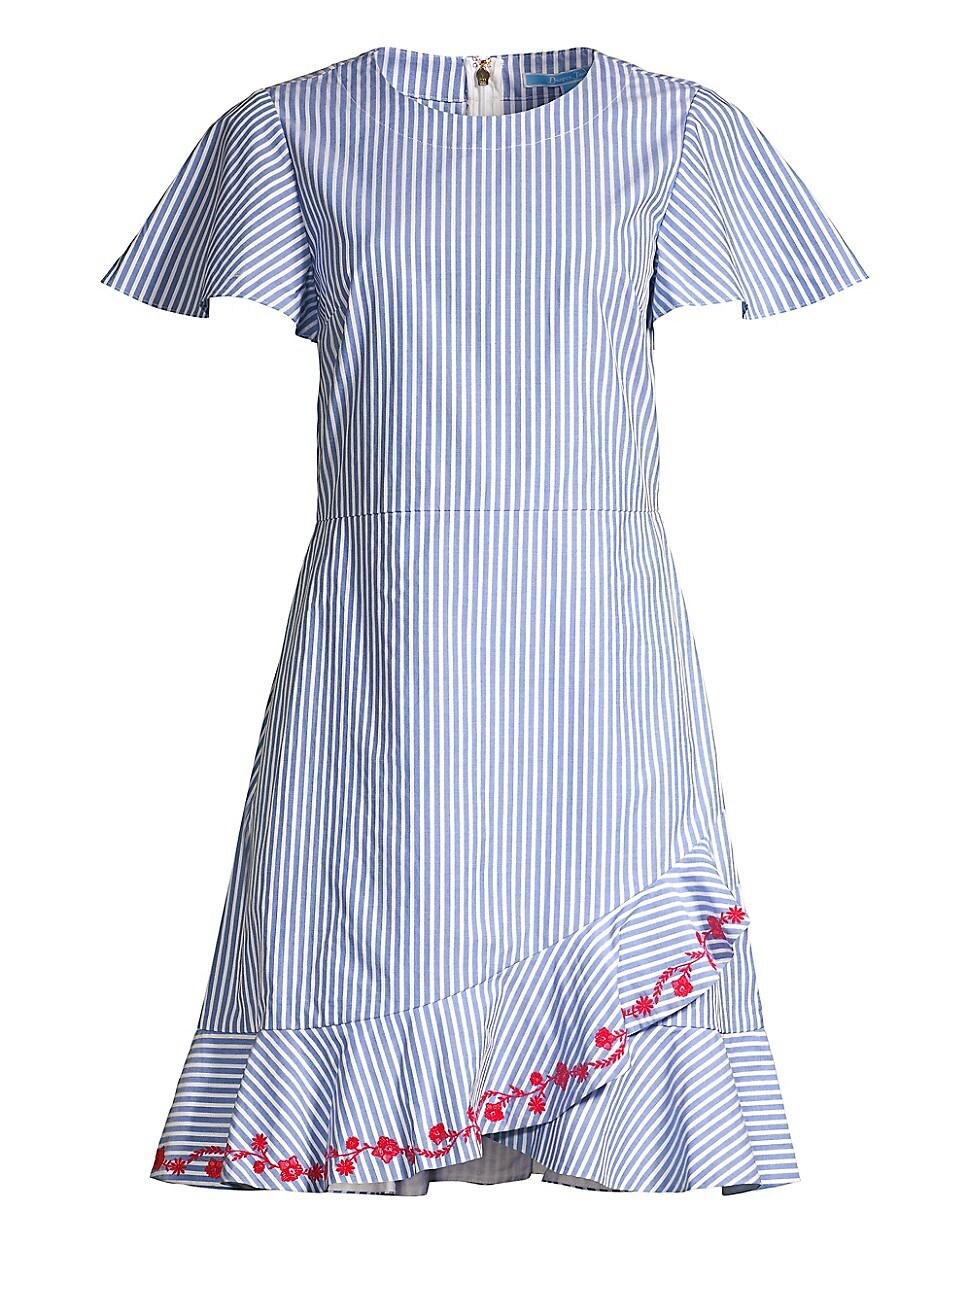 Draper James WOMEN'S EMBROIDERED RUFFLE COTTON DRESS